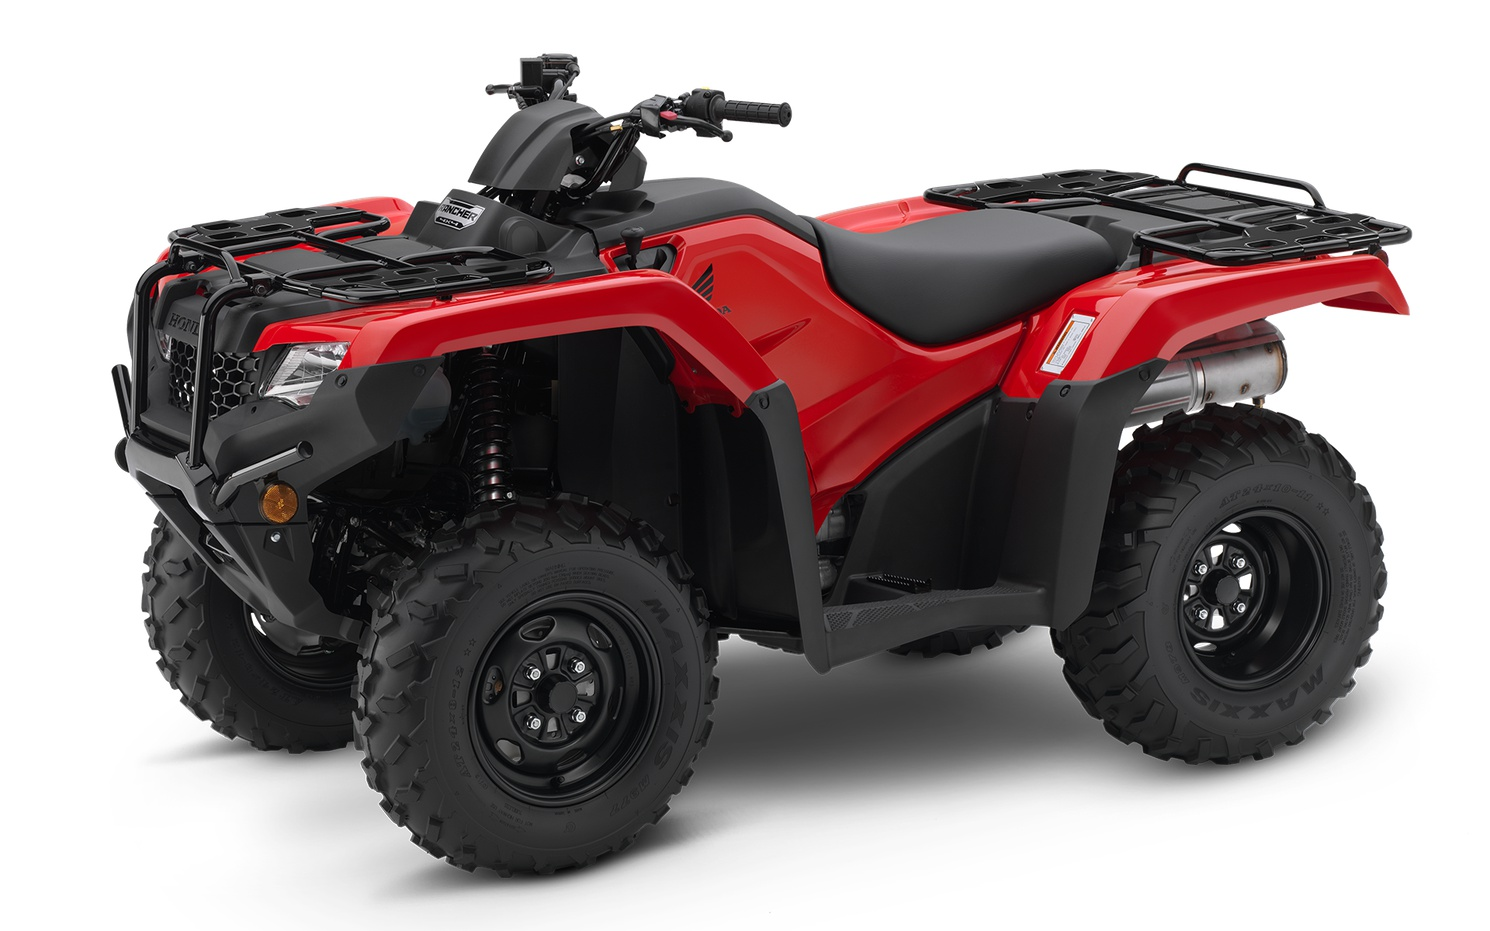 Honda rancher 420 2021 - trx420fm1m